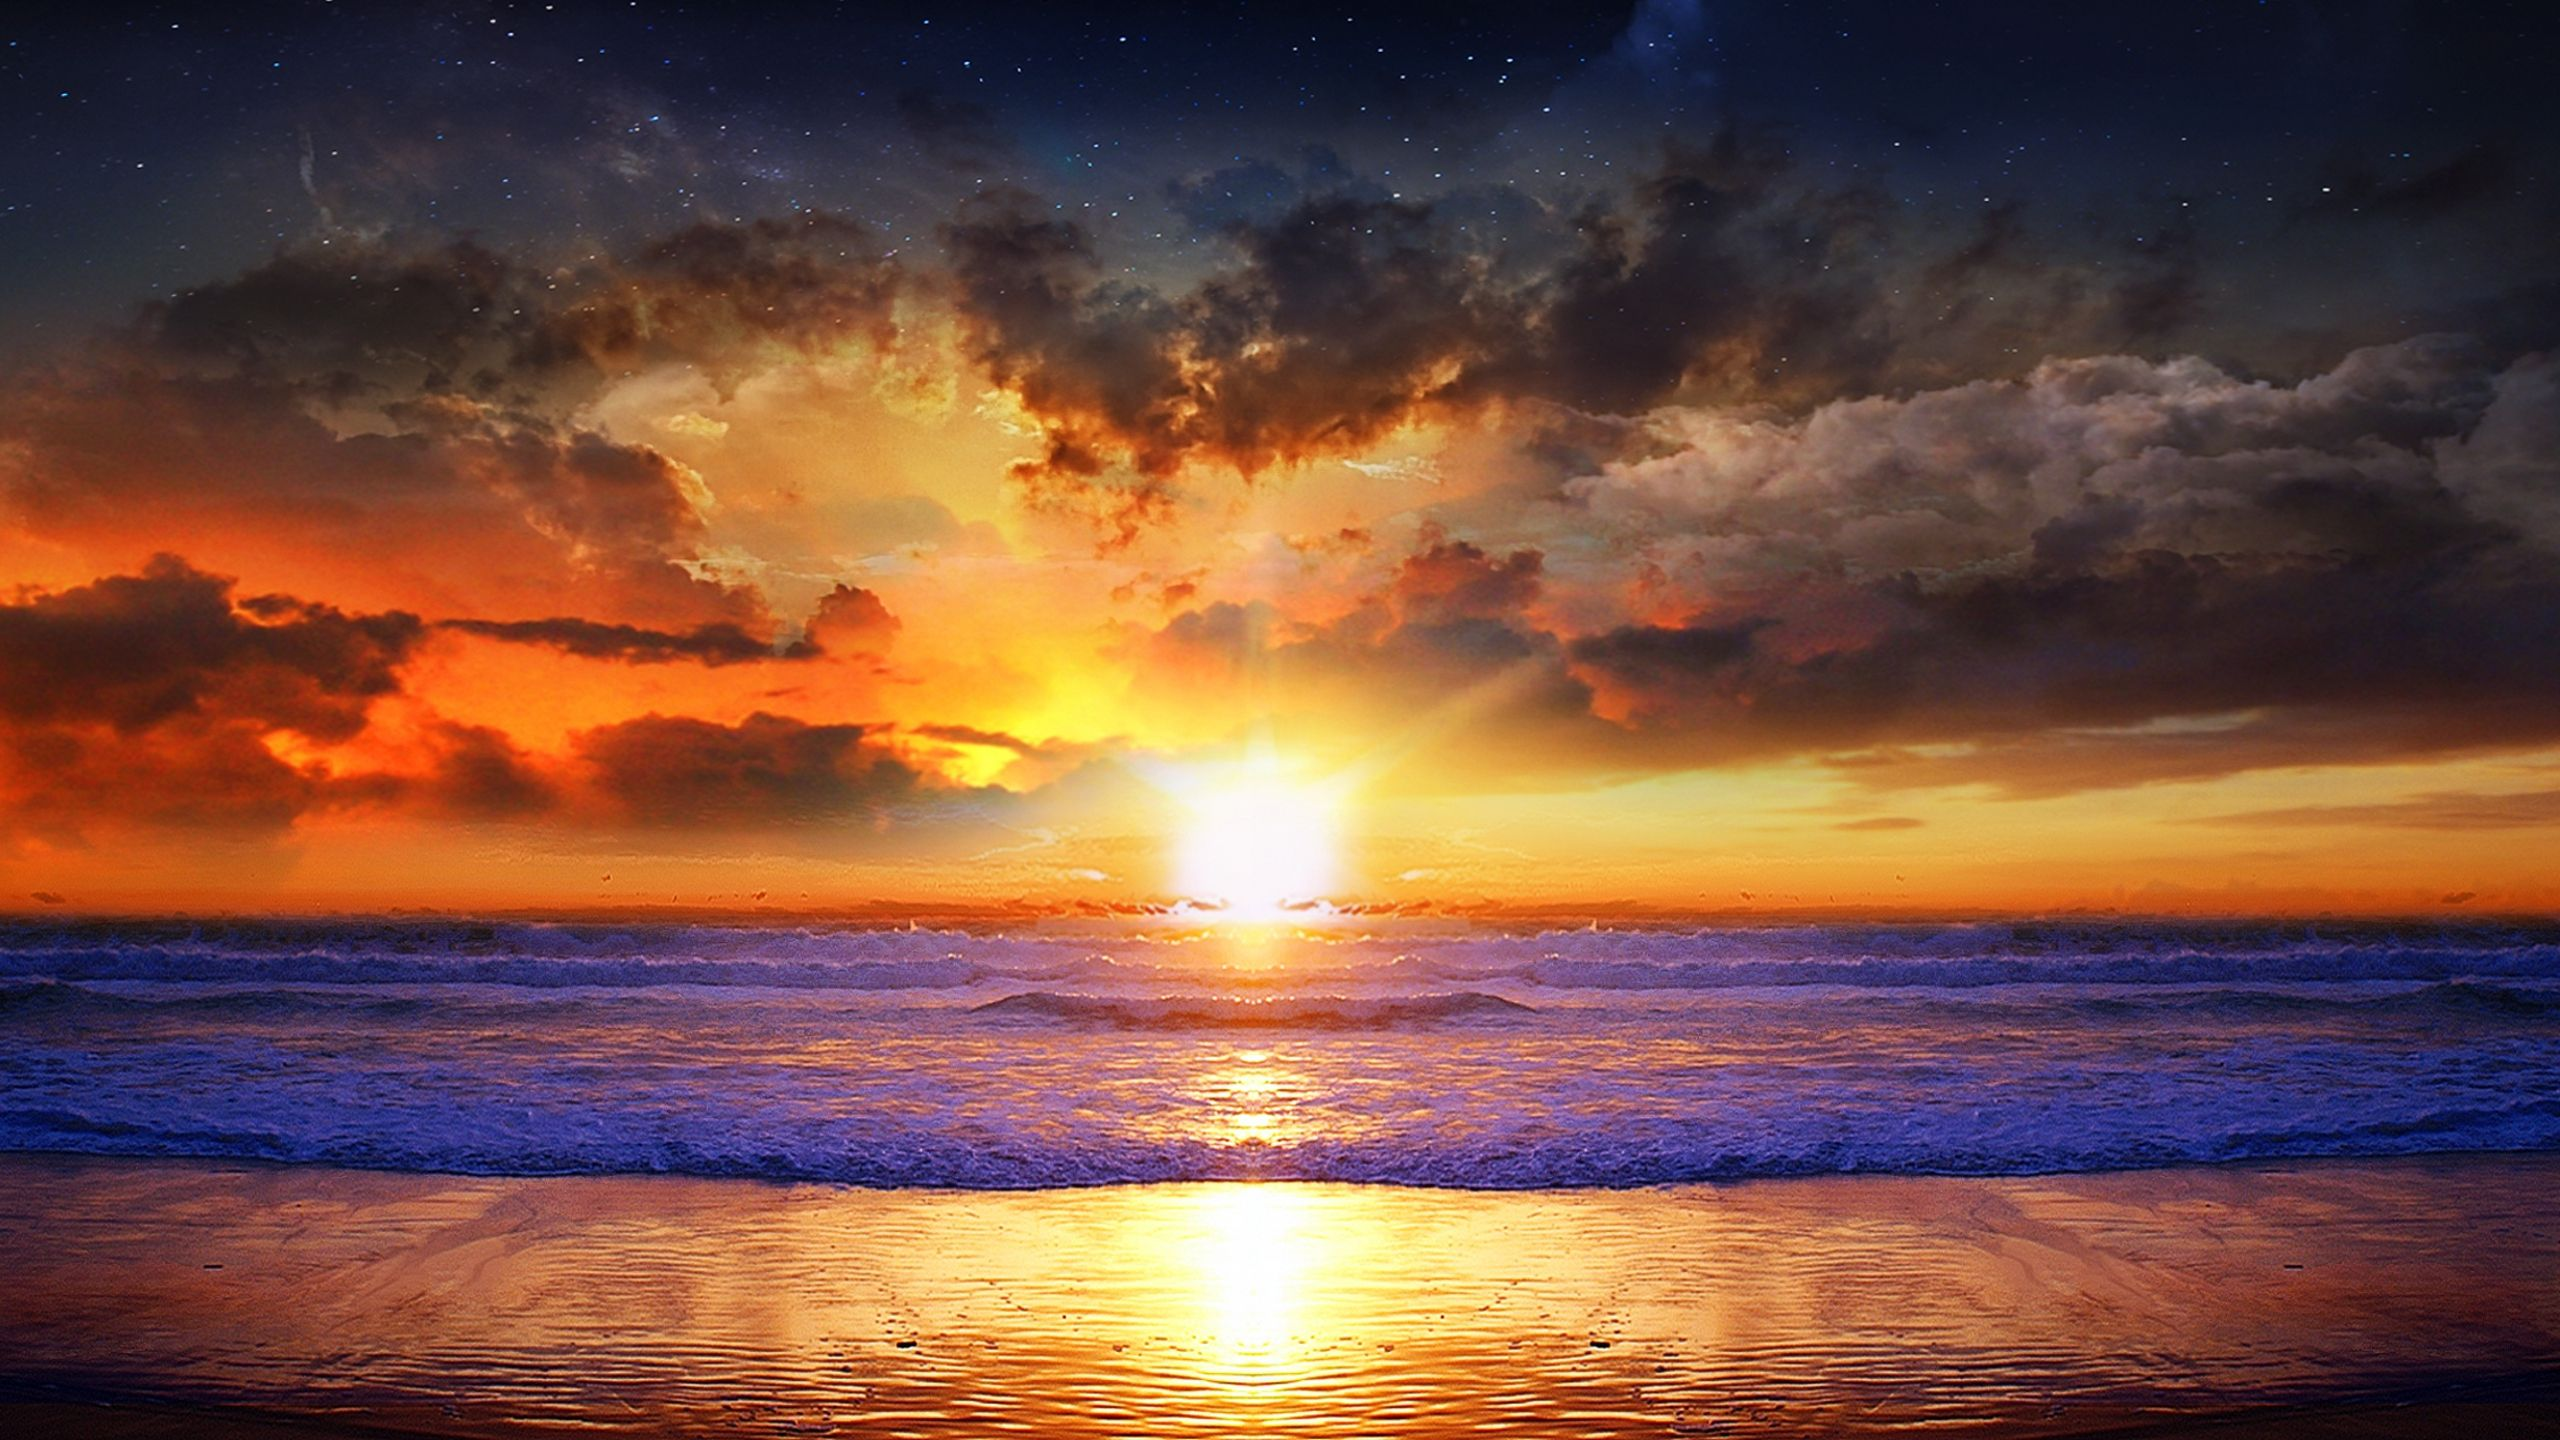 Sunrise Desktop Wallpapers Top Free Sunrise Desktop Backgrounds Wallpaperaccess